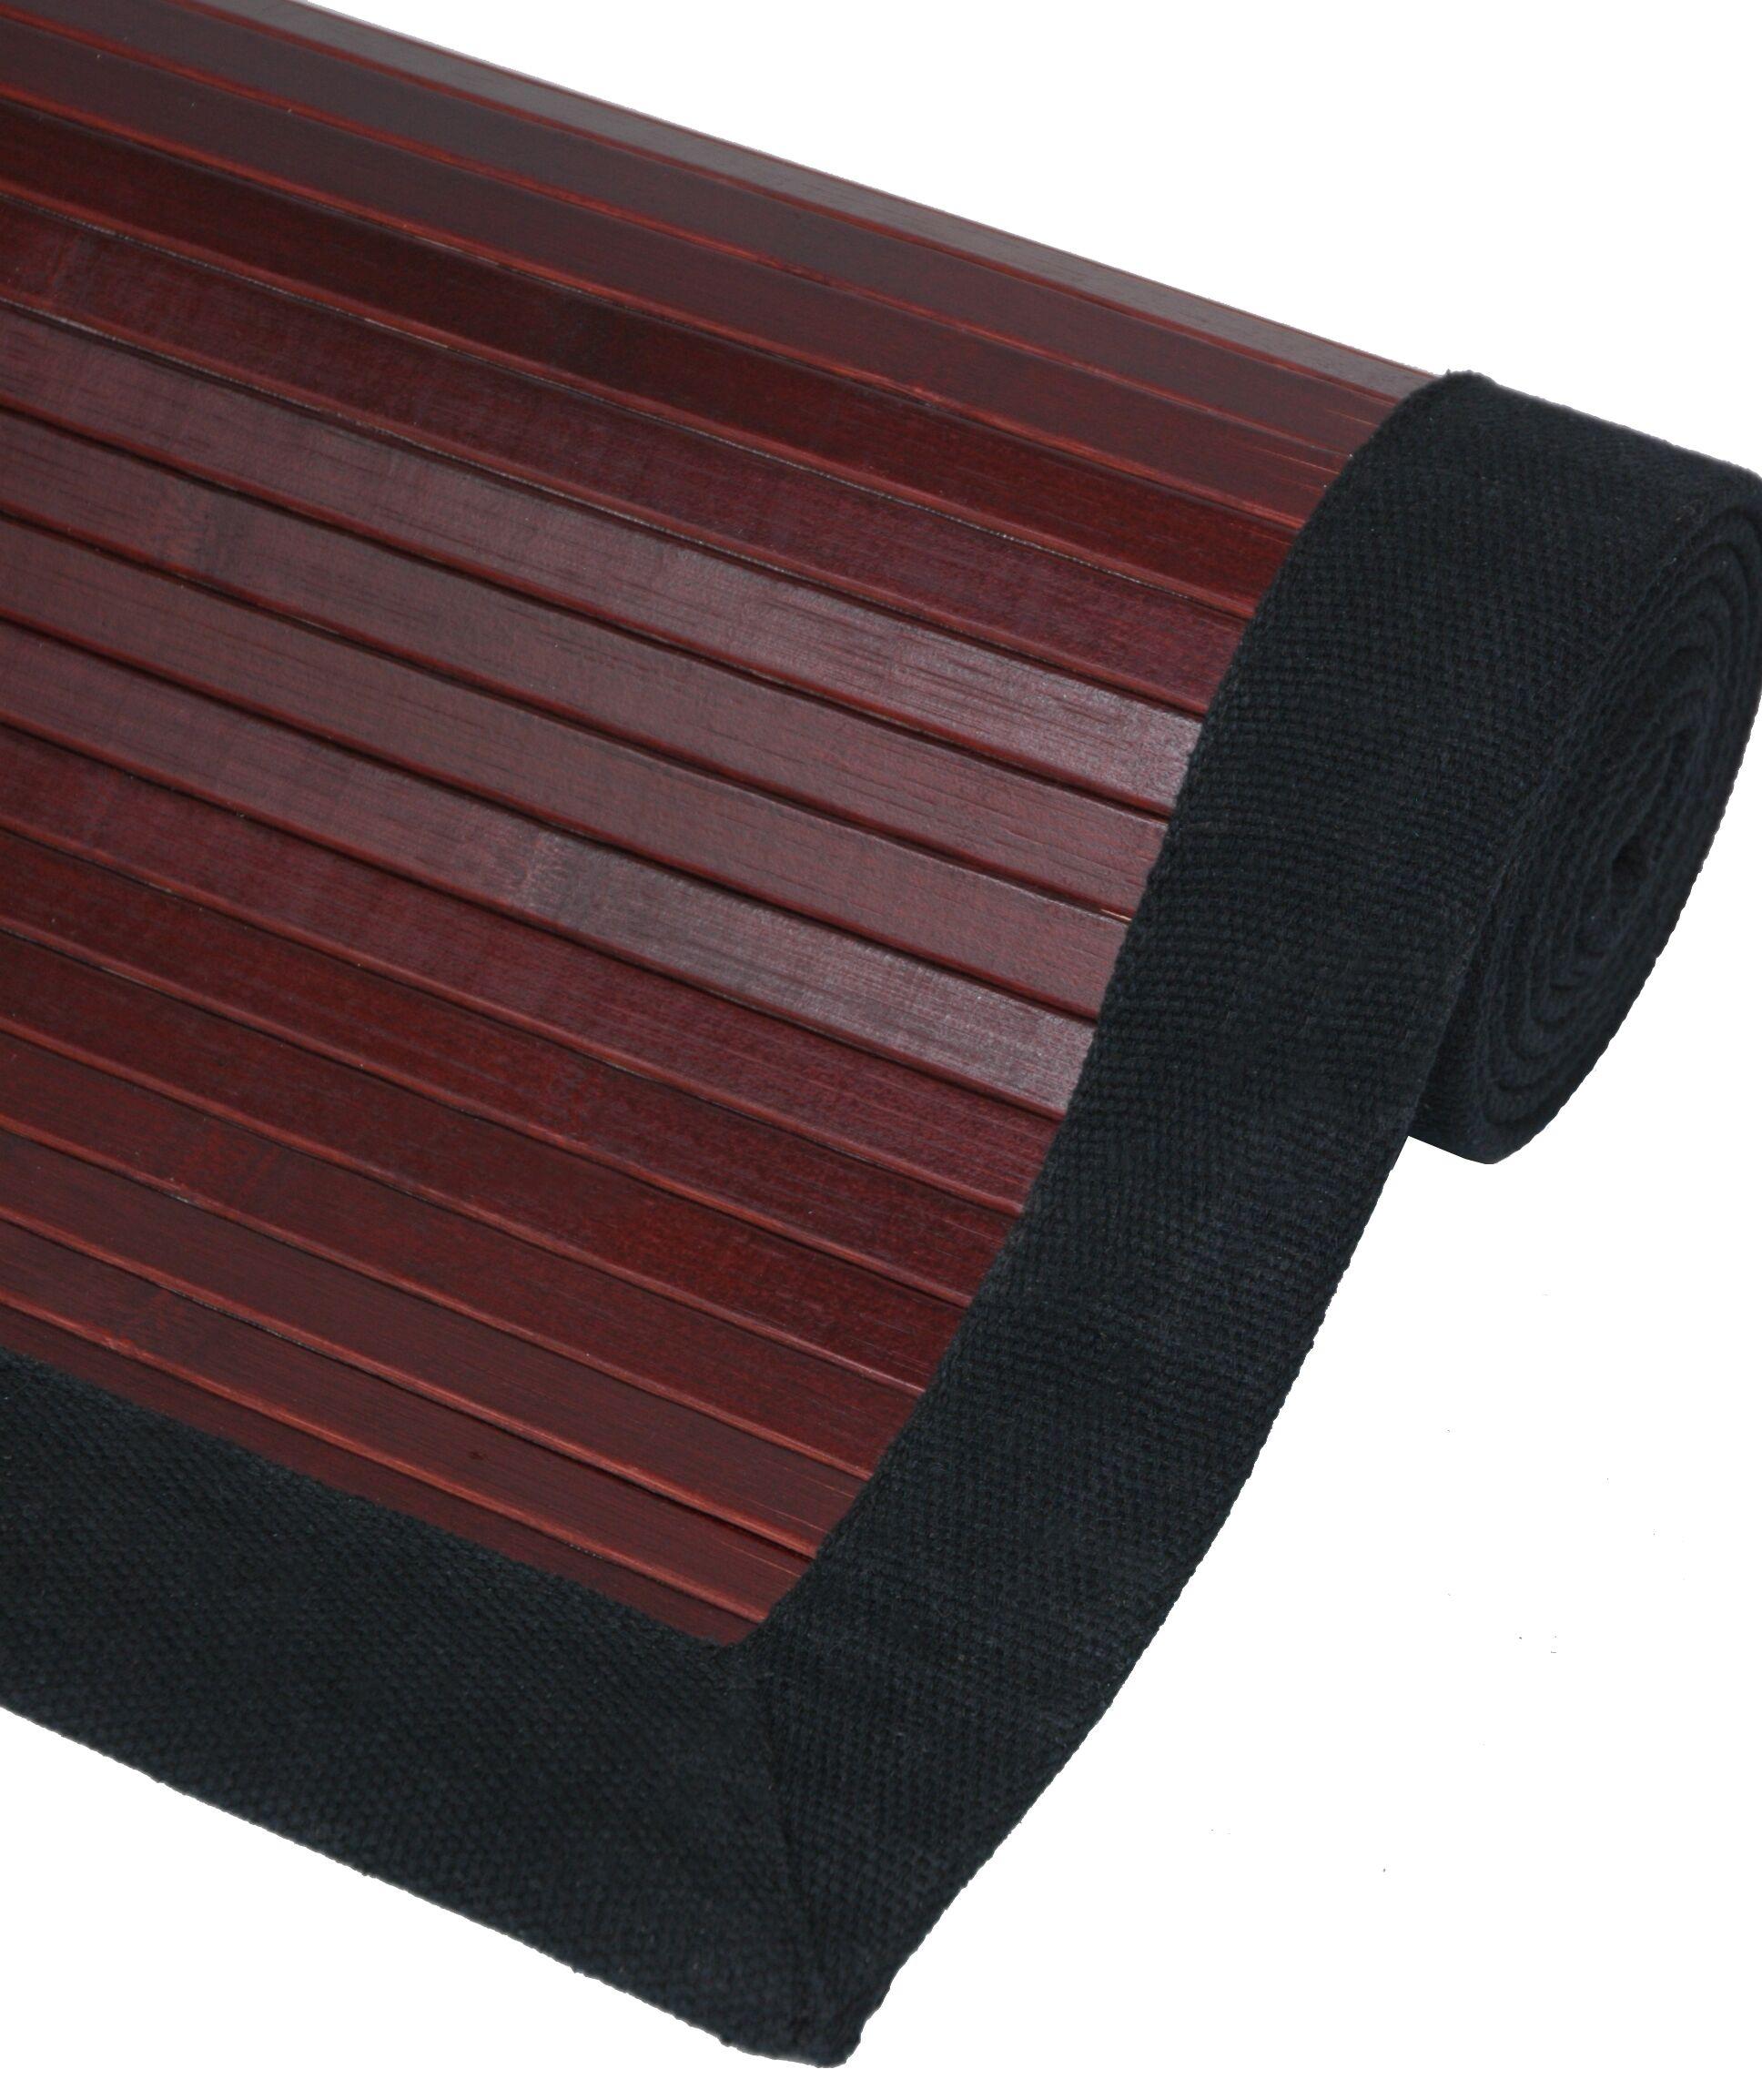 Bamboo Mahogany Area Rug Rug Size: 5' x 8'